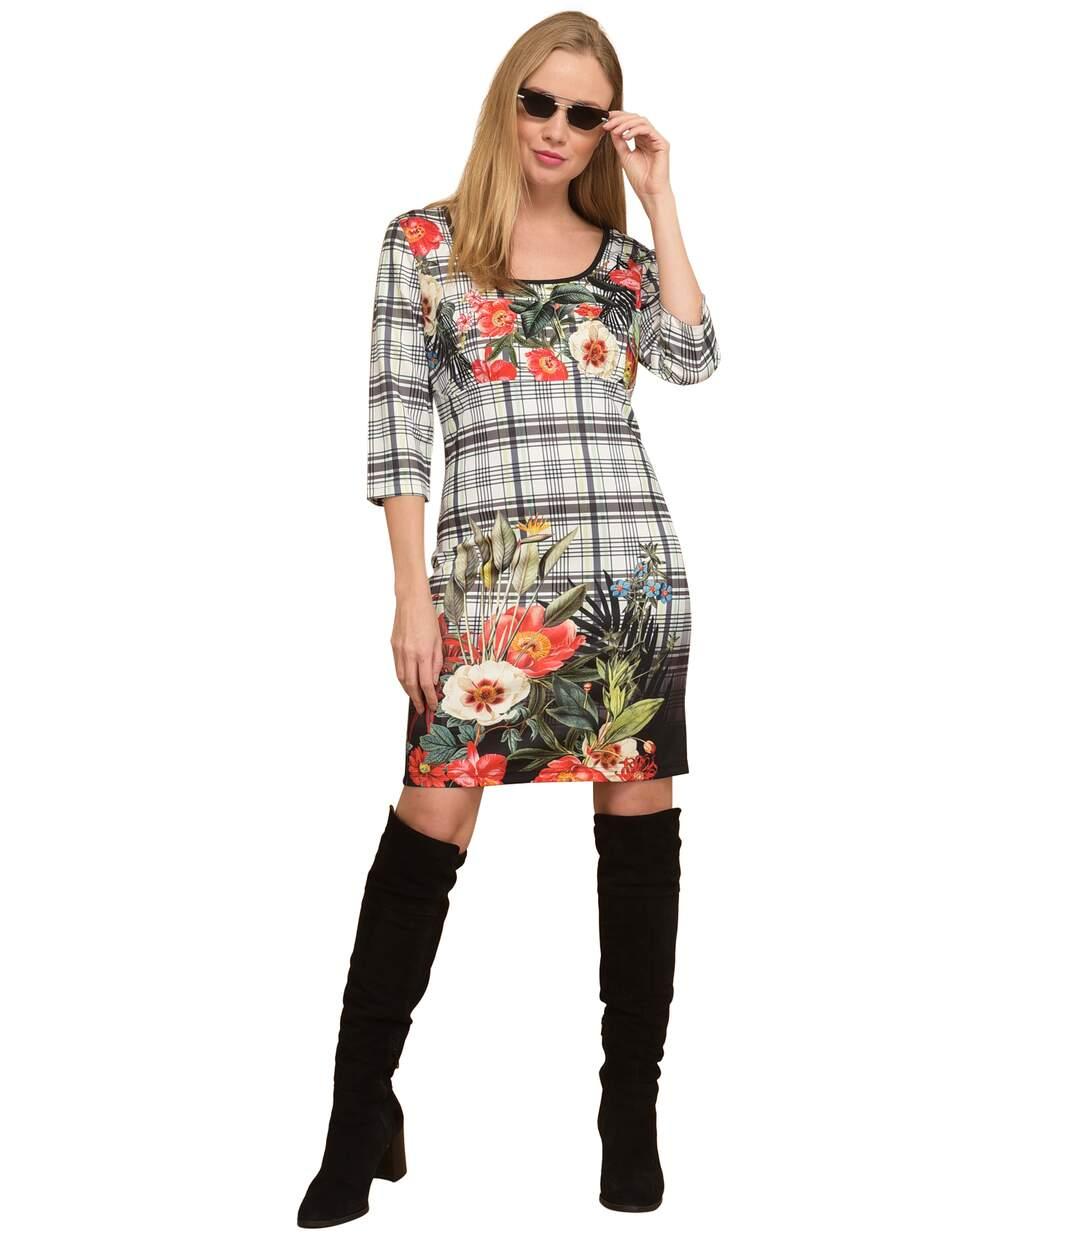 101 Idees Robe Imprimee Manches 3 4 Femme Atlas For Men